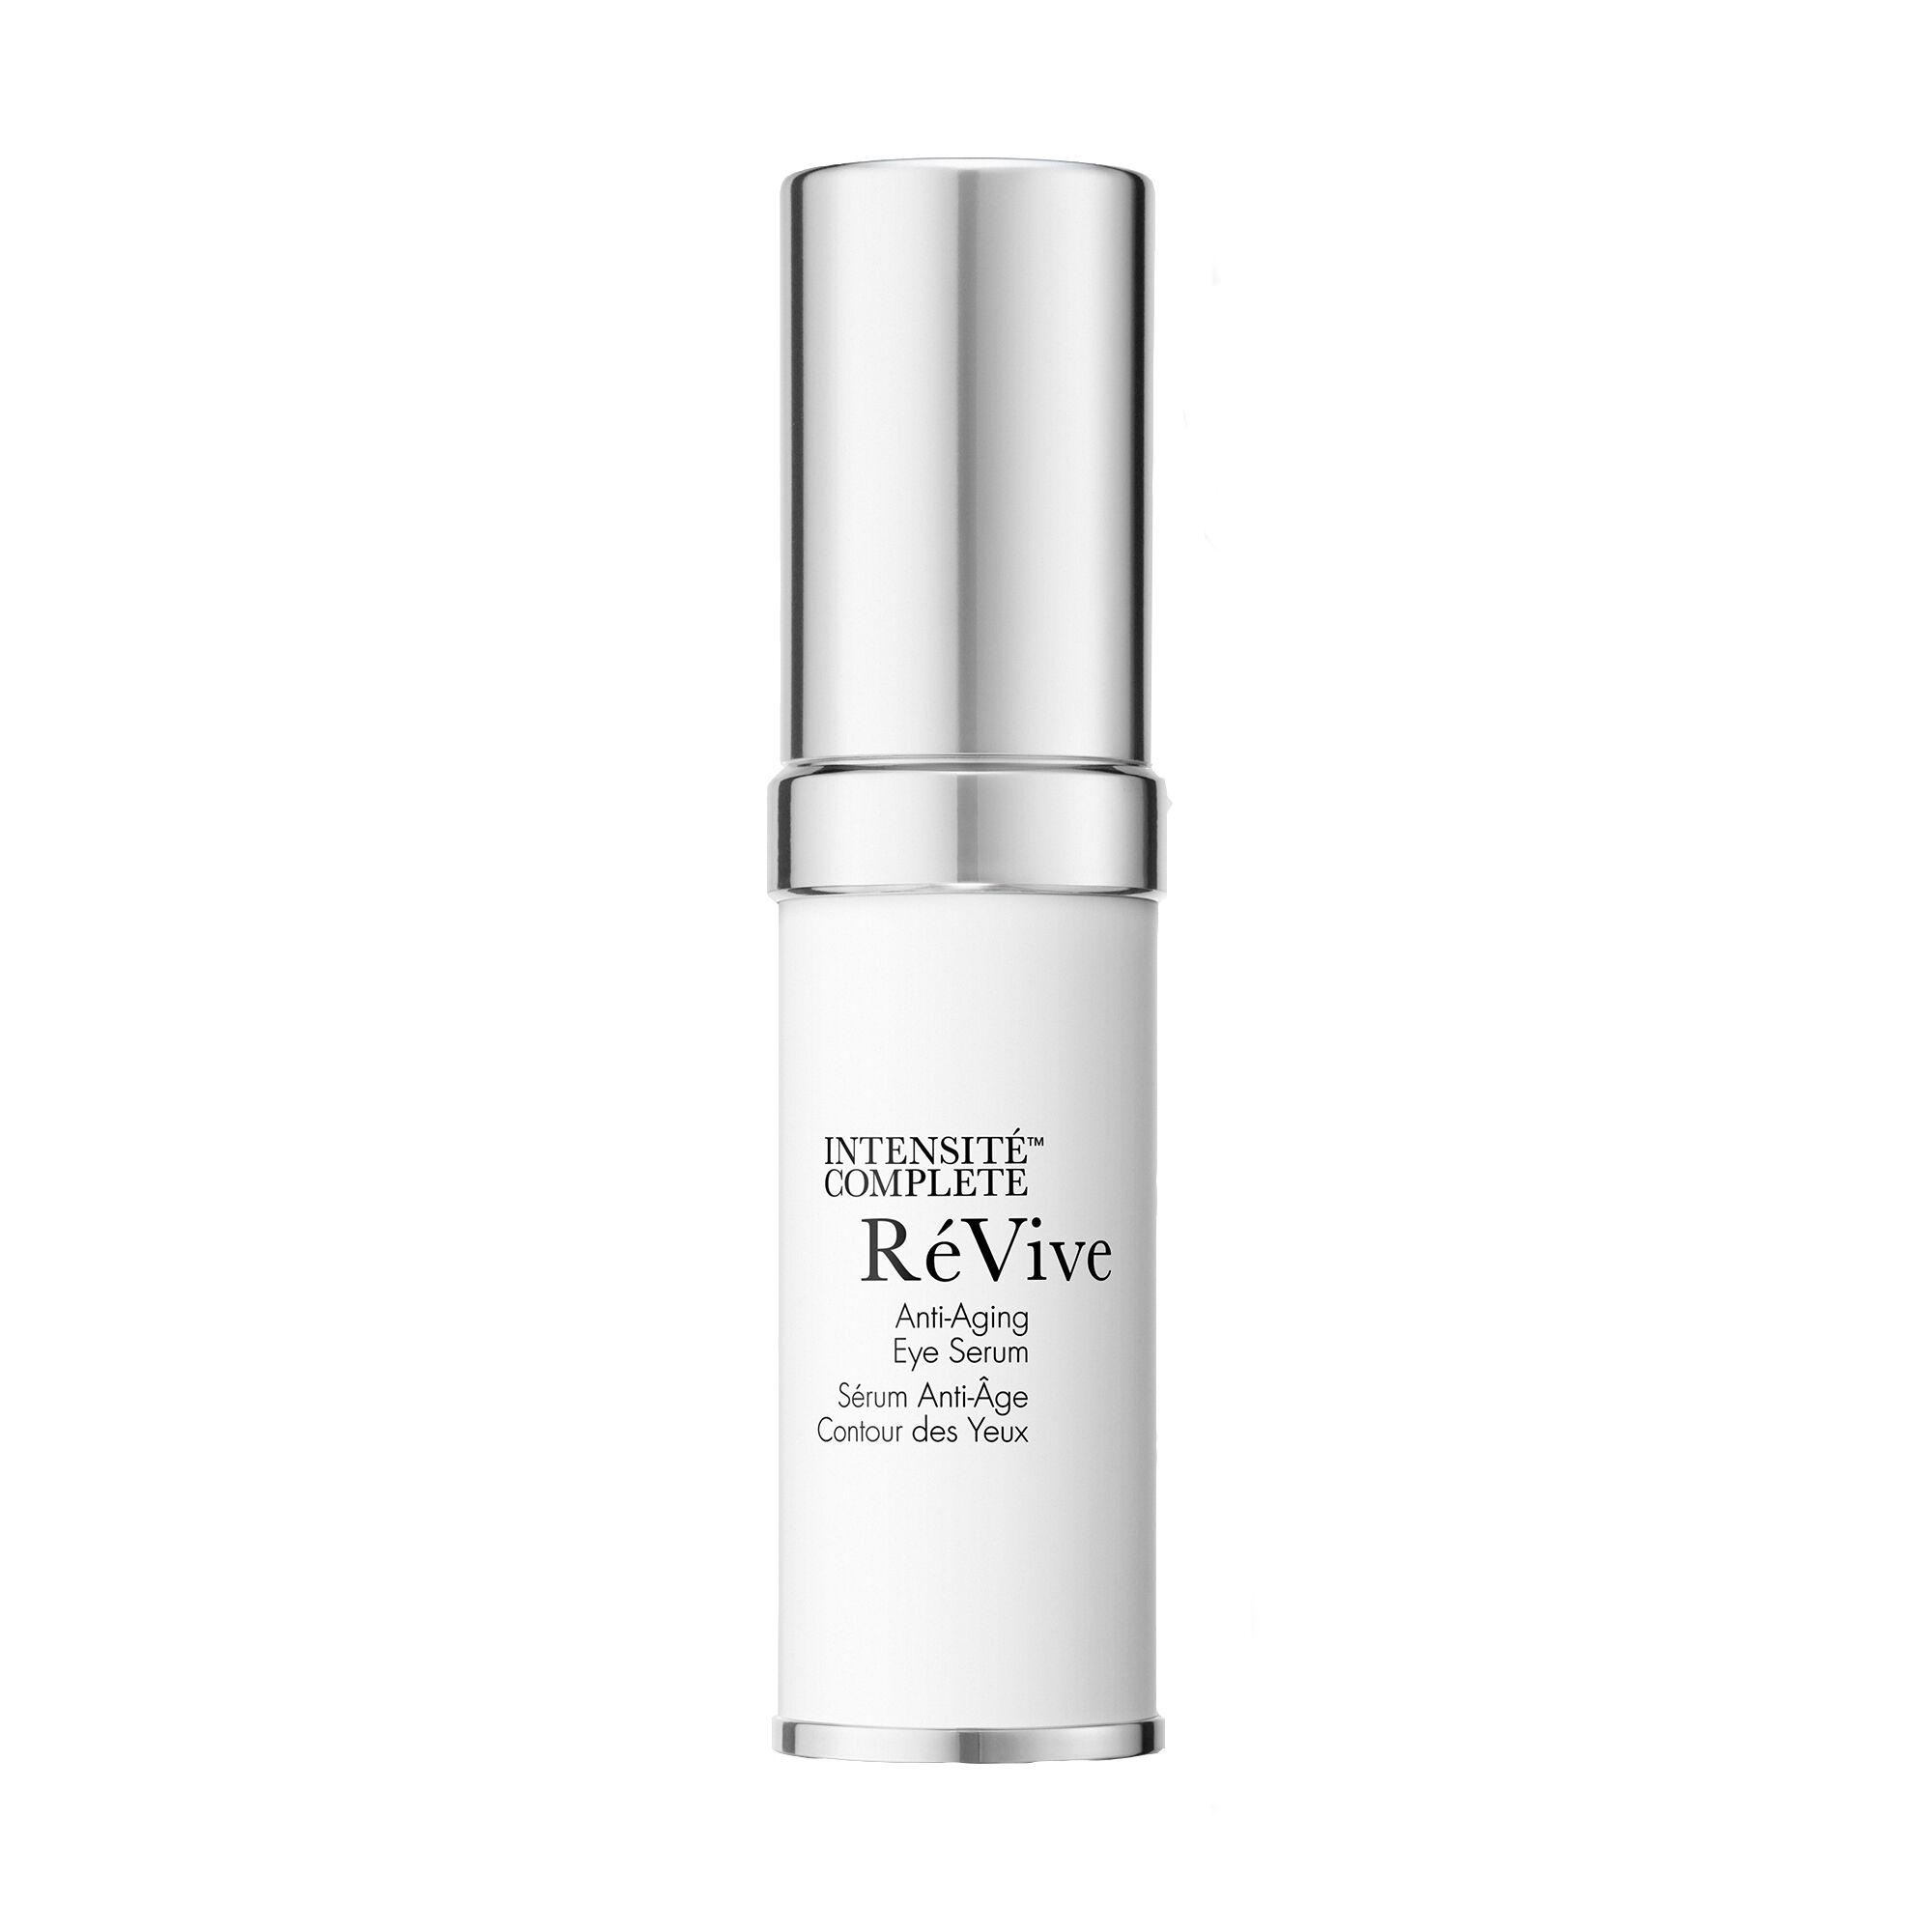 Révive - Intensité Complete Anti-Aging Eye Serum by Révive